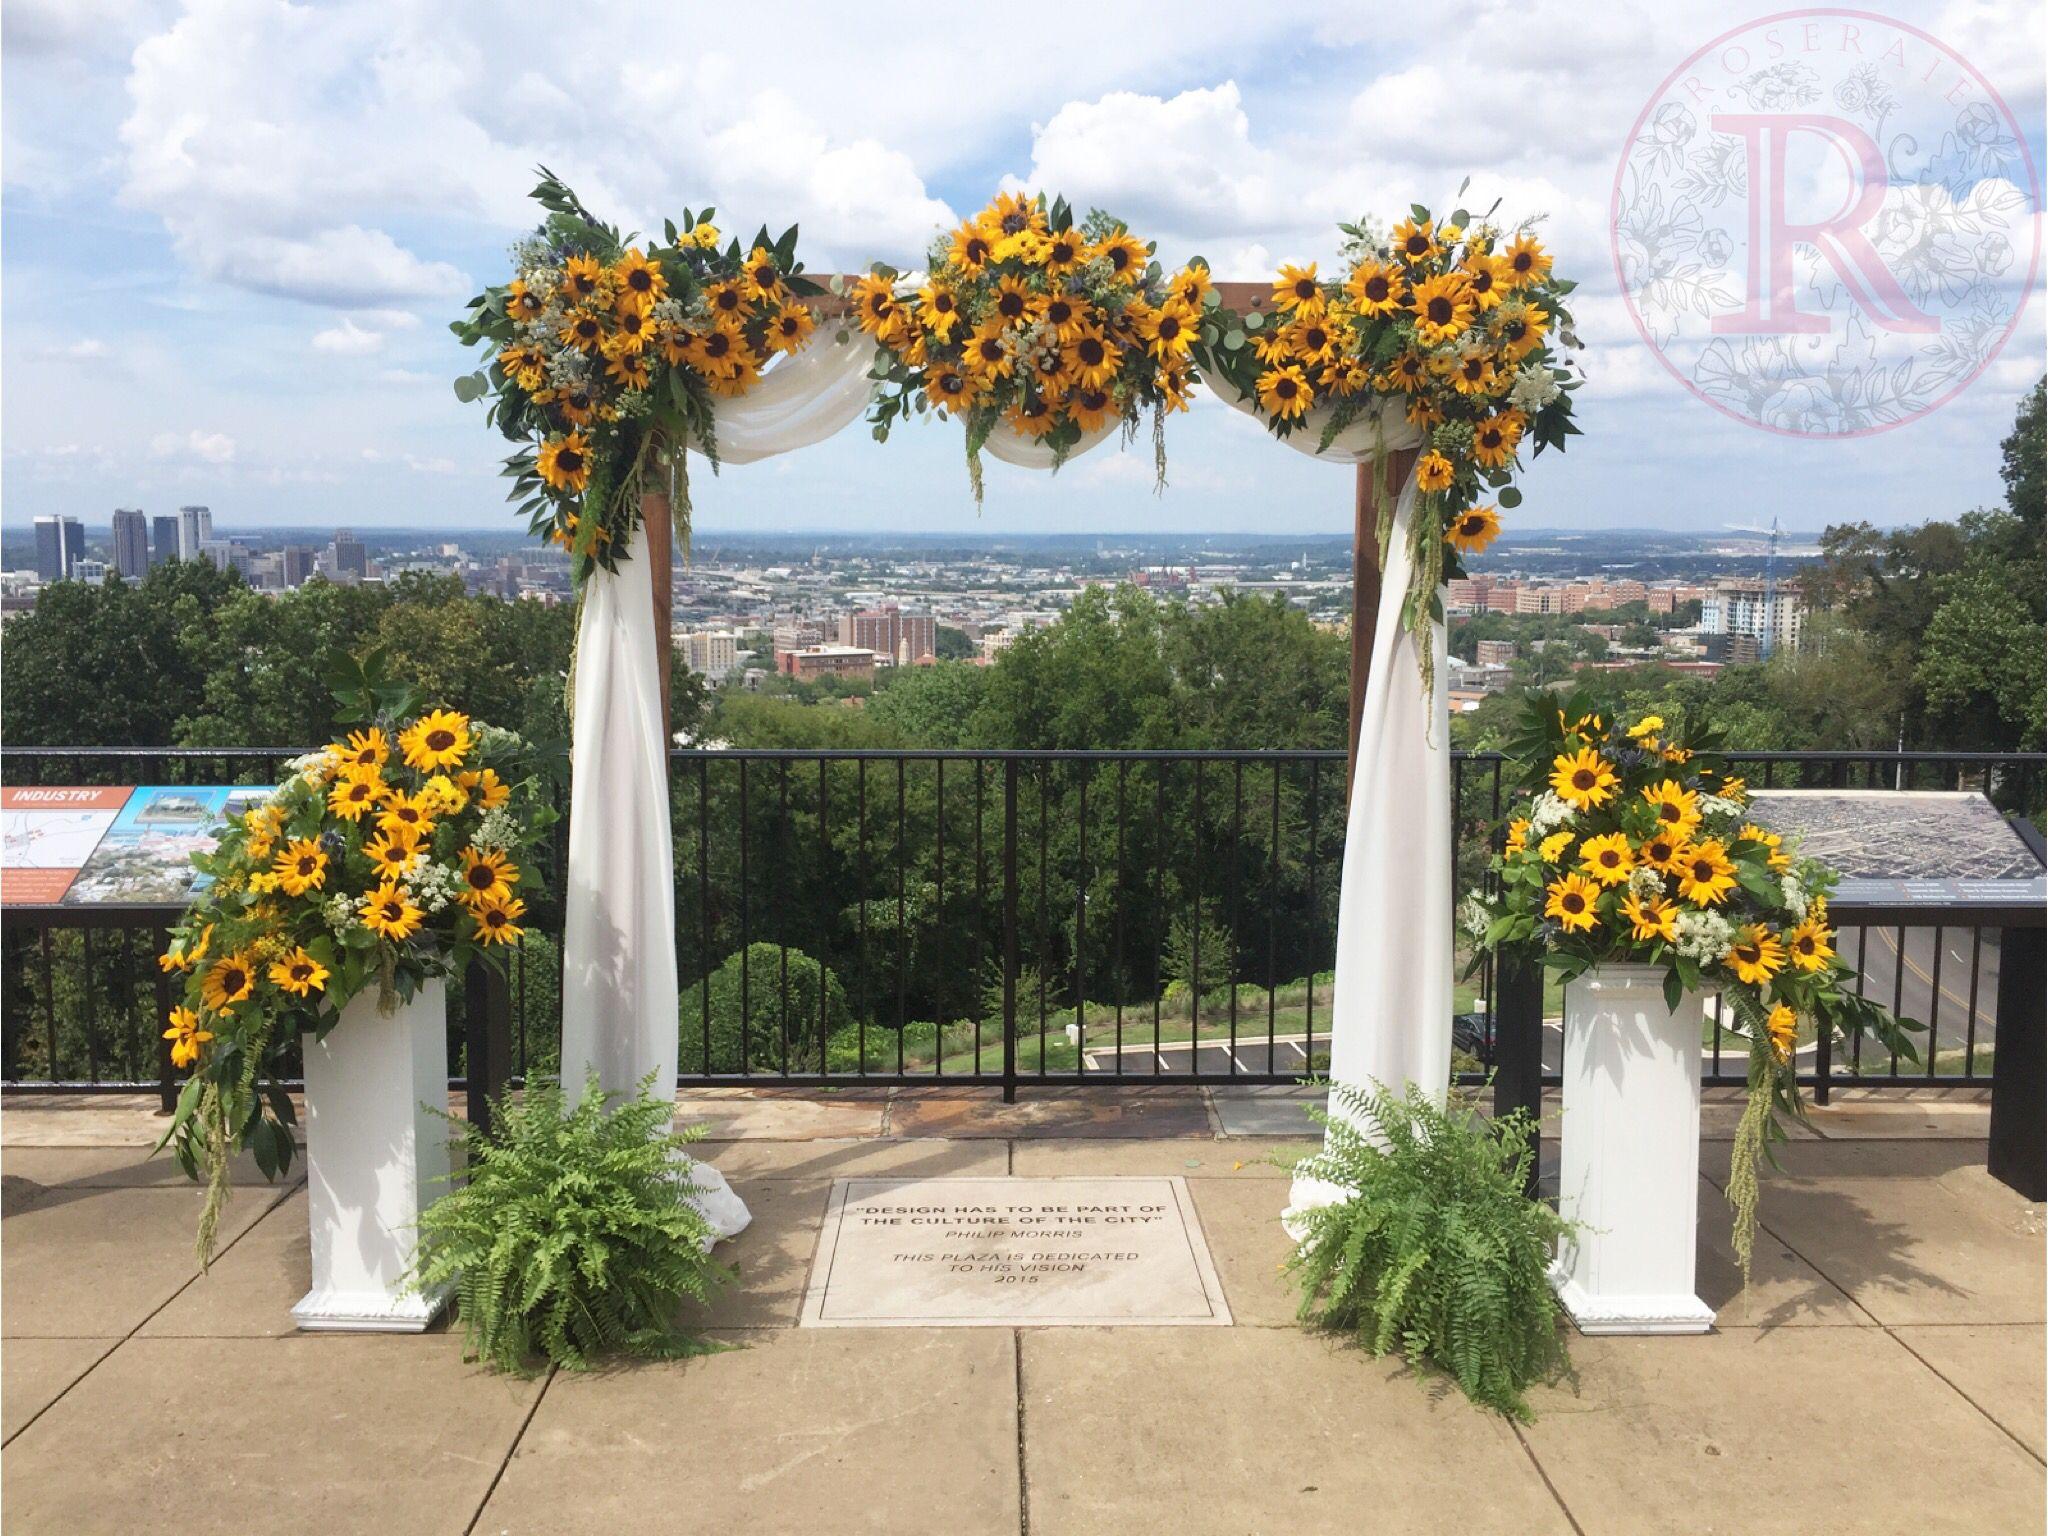 Sunflower Wedding Flowers By Roseraie Floral Design Fall Sunflower Weddings Wedding Flowers Sunflowers Sunflower Wedding Decorations